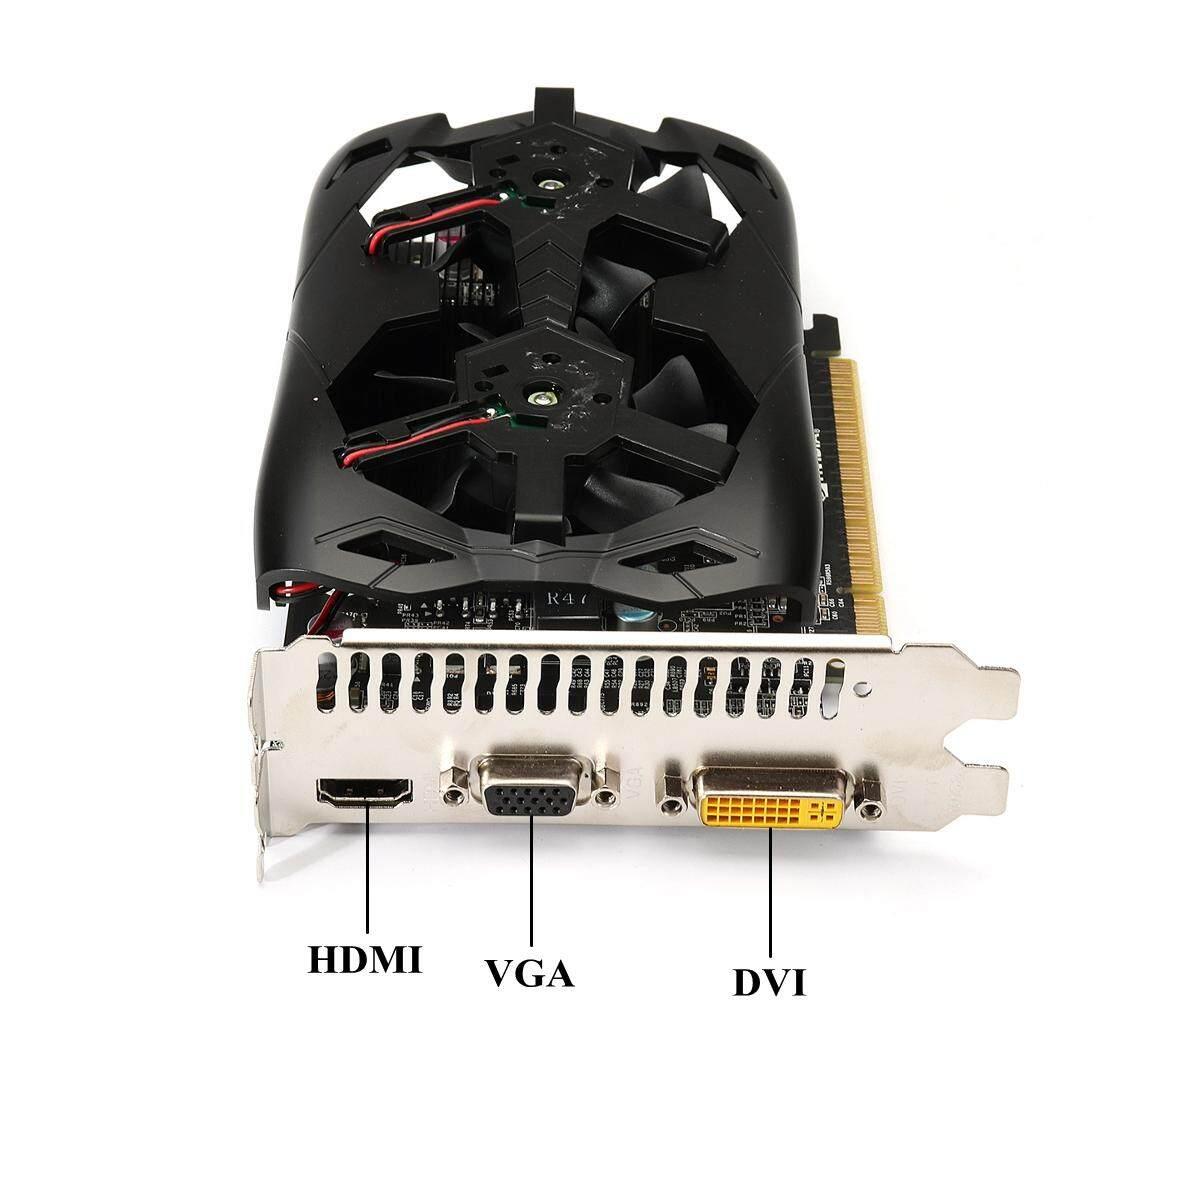 Beli Sekarang Gtx1060 3gb Ddr5 128bit Game Graphics Card Pci E Motherboard Suntech H55 Lga 1156 Warna Model Dan Ukuran Gt730 4gb Express 20 Dvi Vga Hdmi Intl Beserta Gambarnya